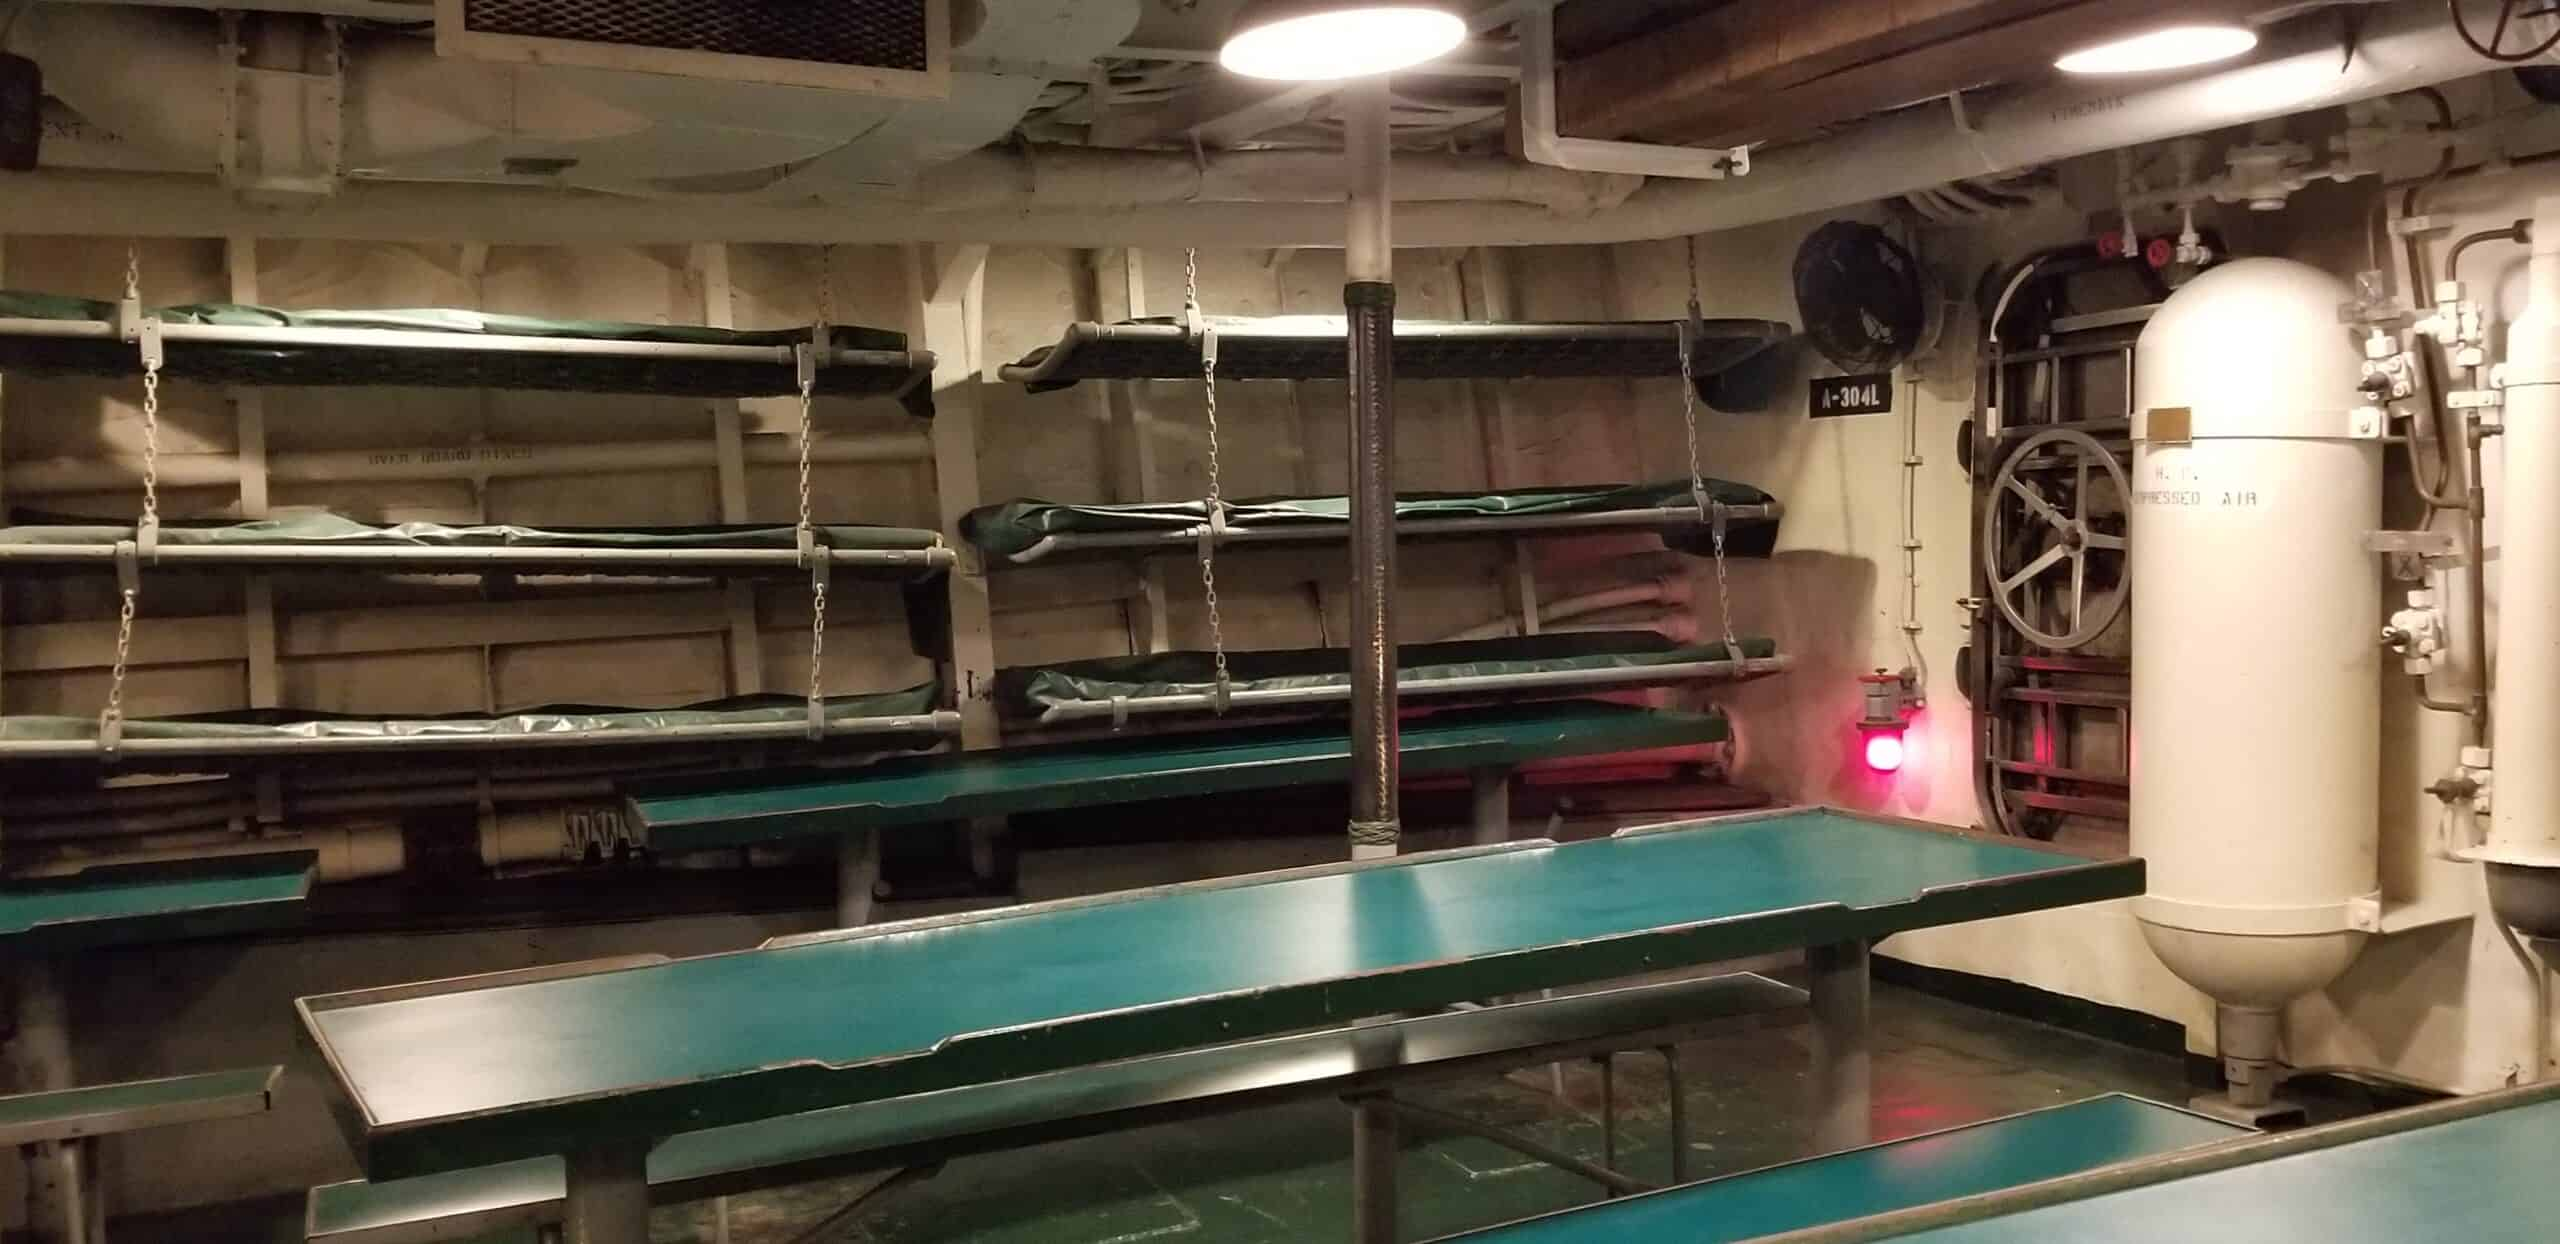 sleeping cots on the USS Kidd